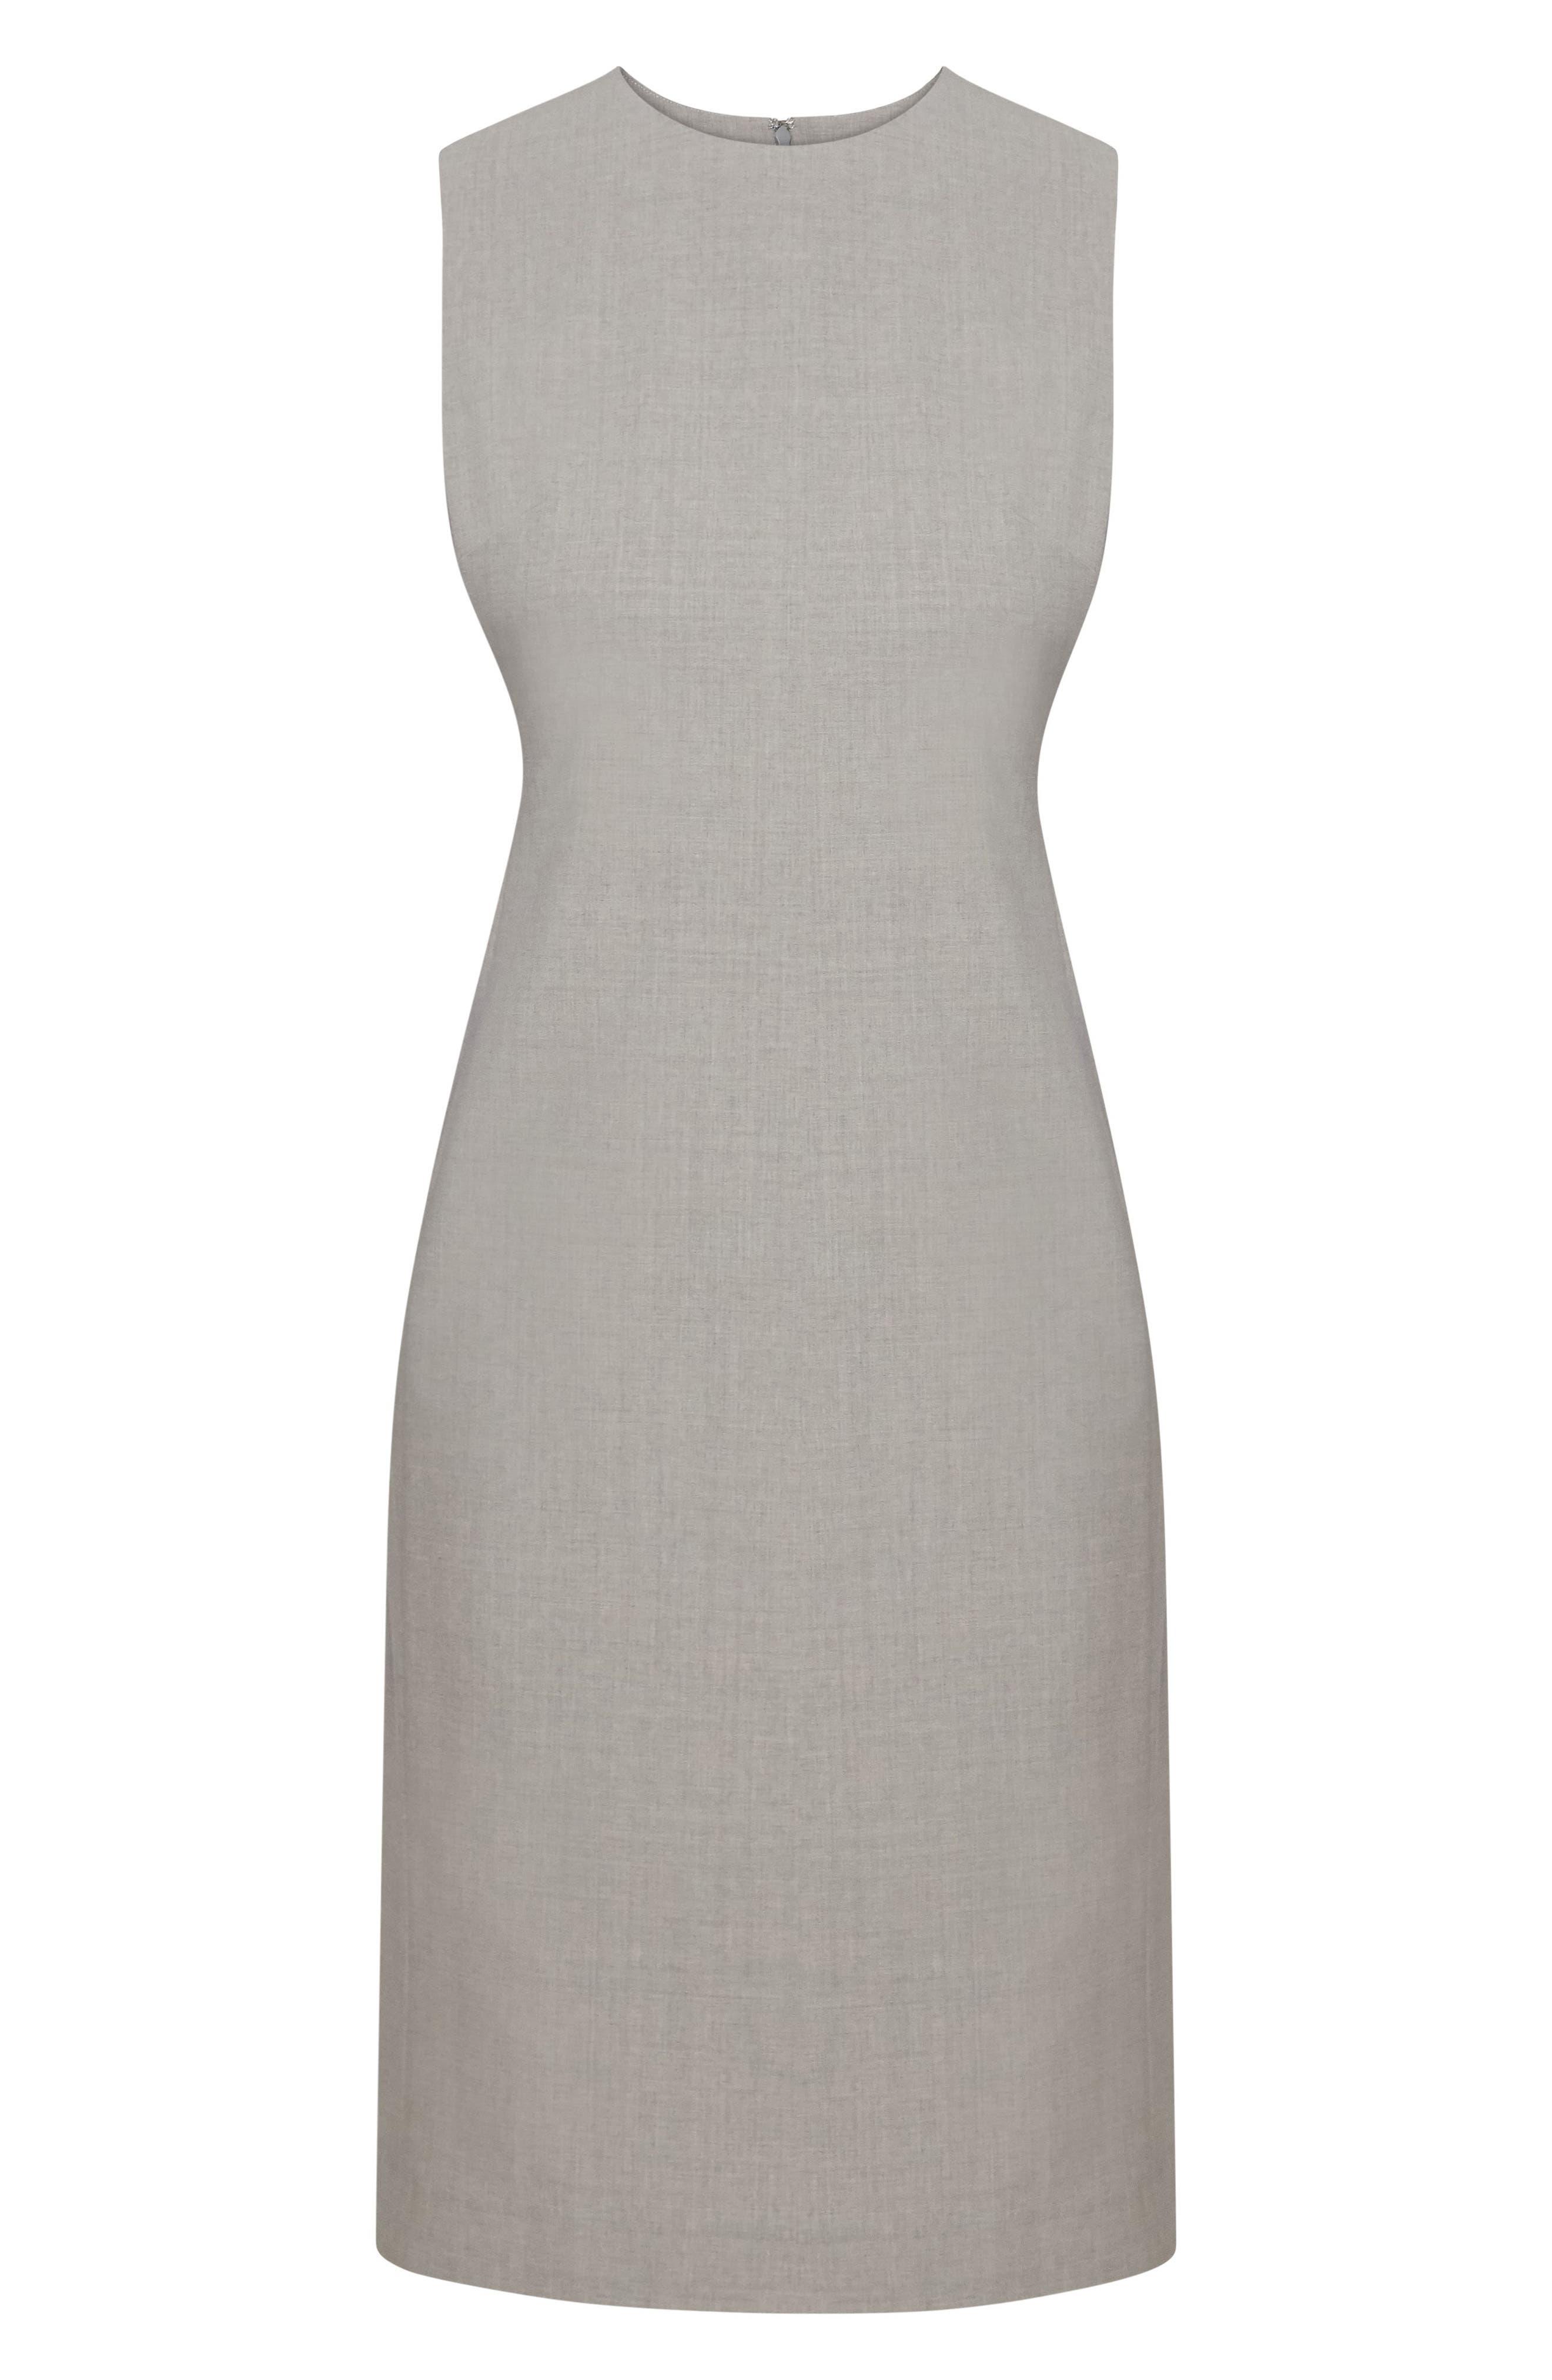 THEORY,                             Eano Good Wool Sheath Dress,                             Alternate thumbnail 4, color,                             050